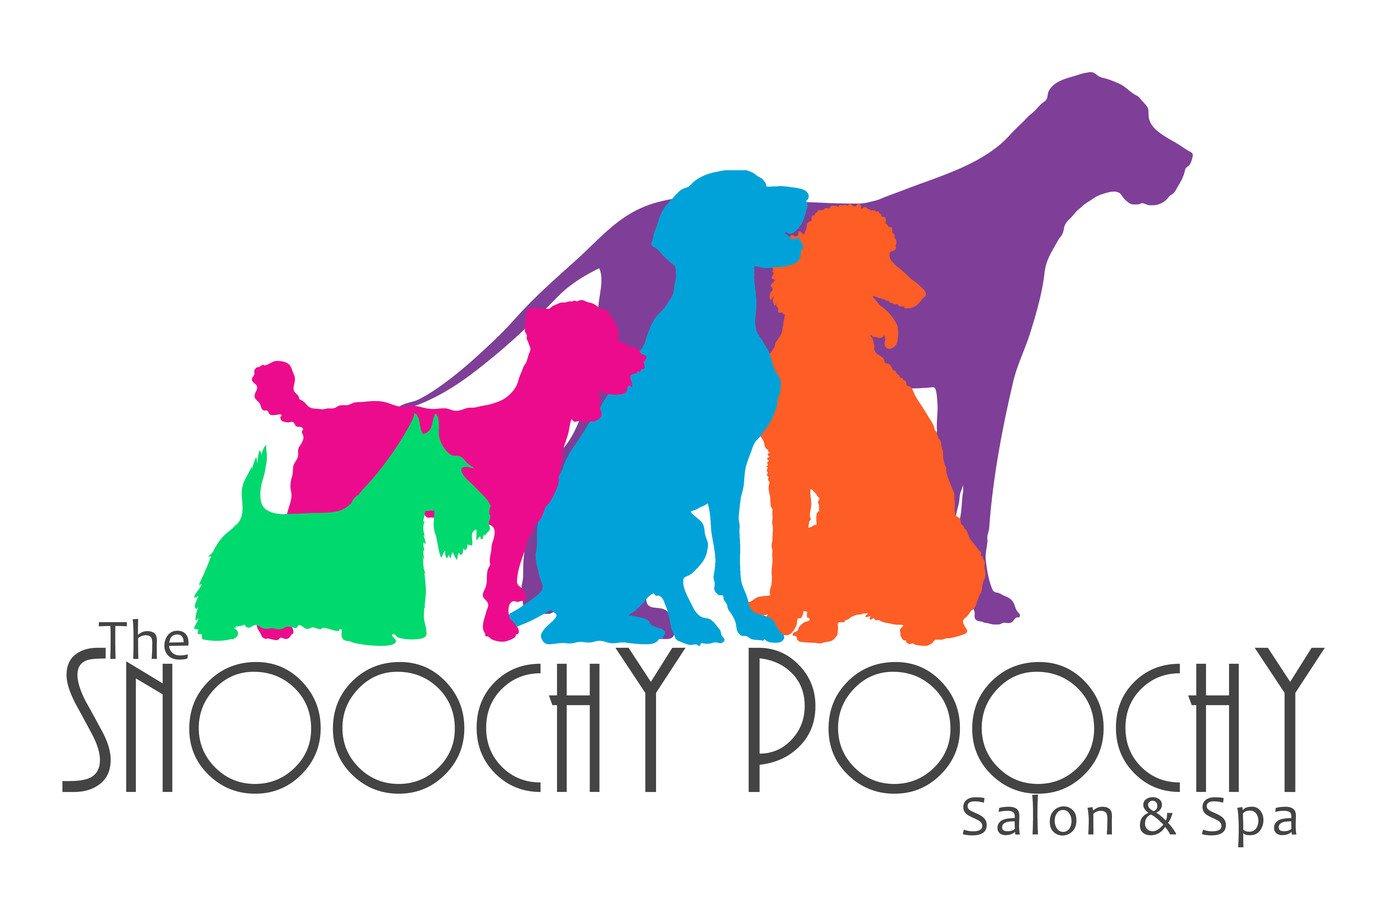 The Snoochy Poochy Salon and Spa